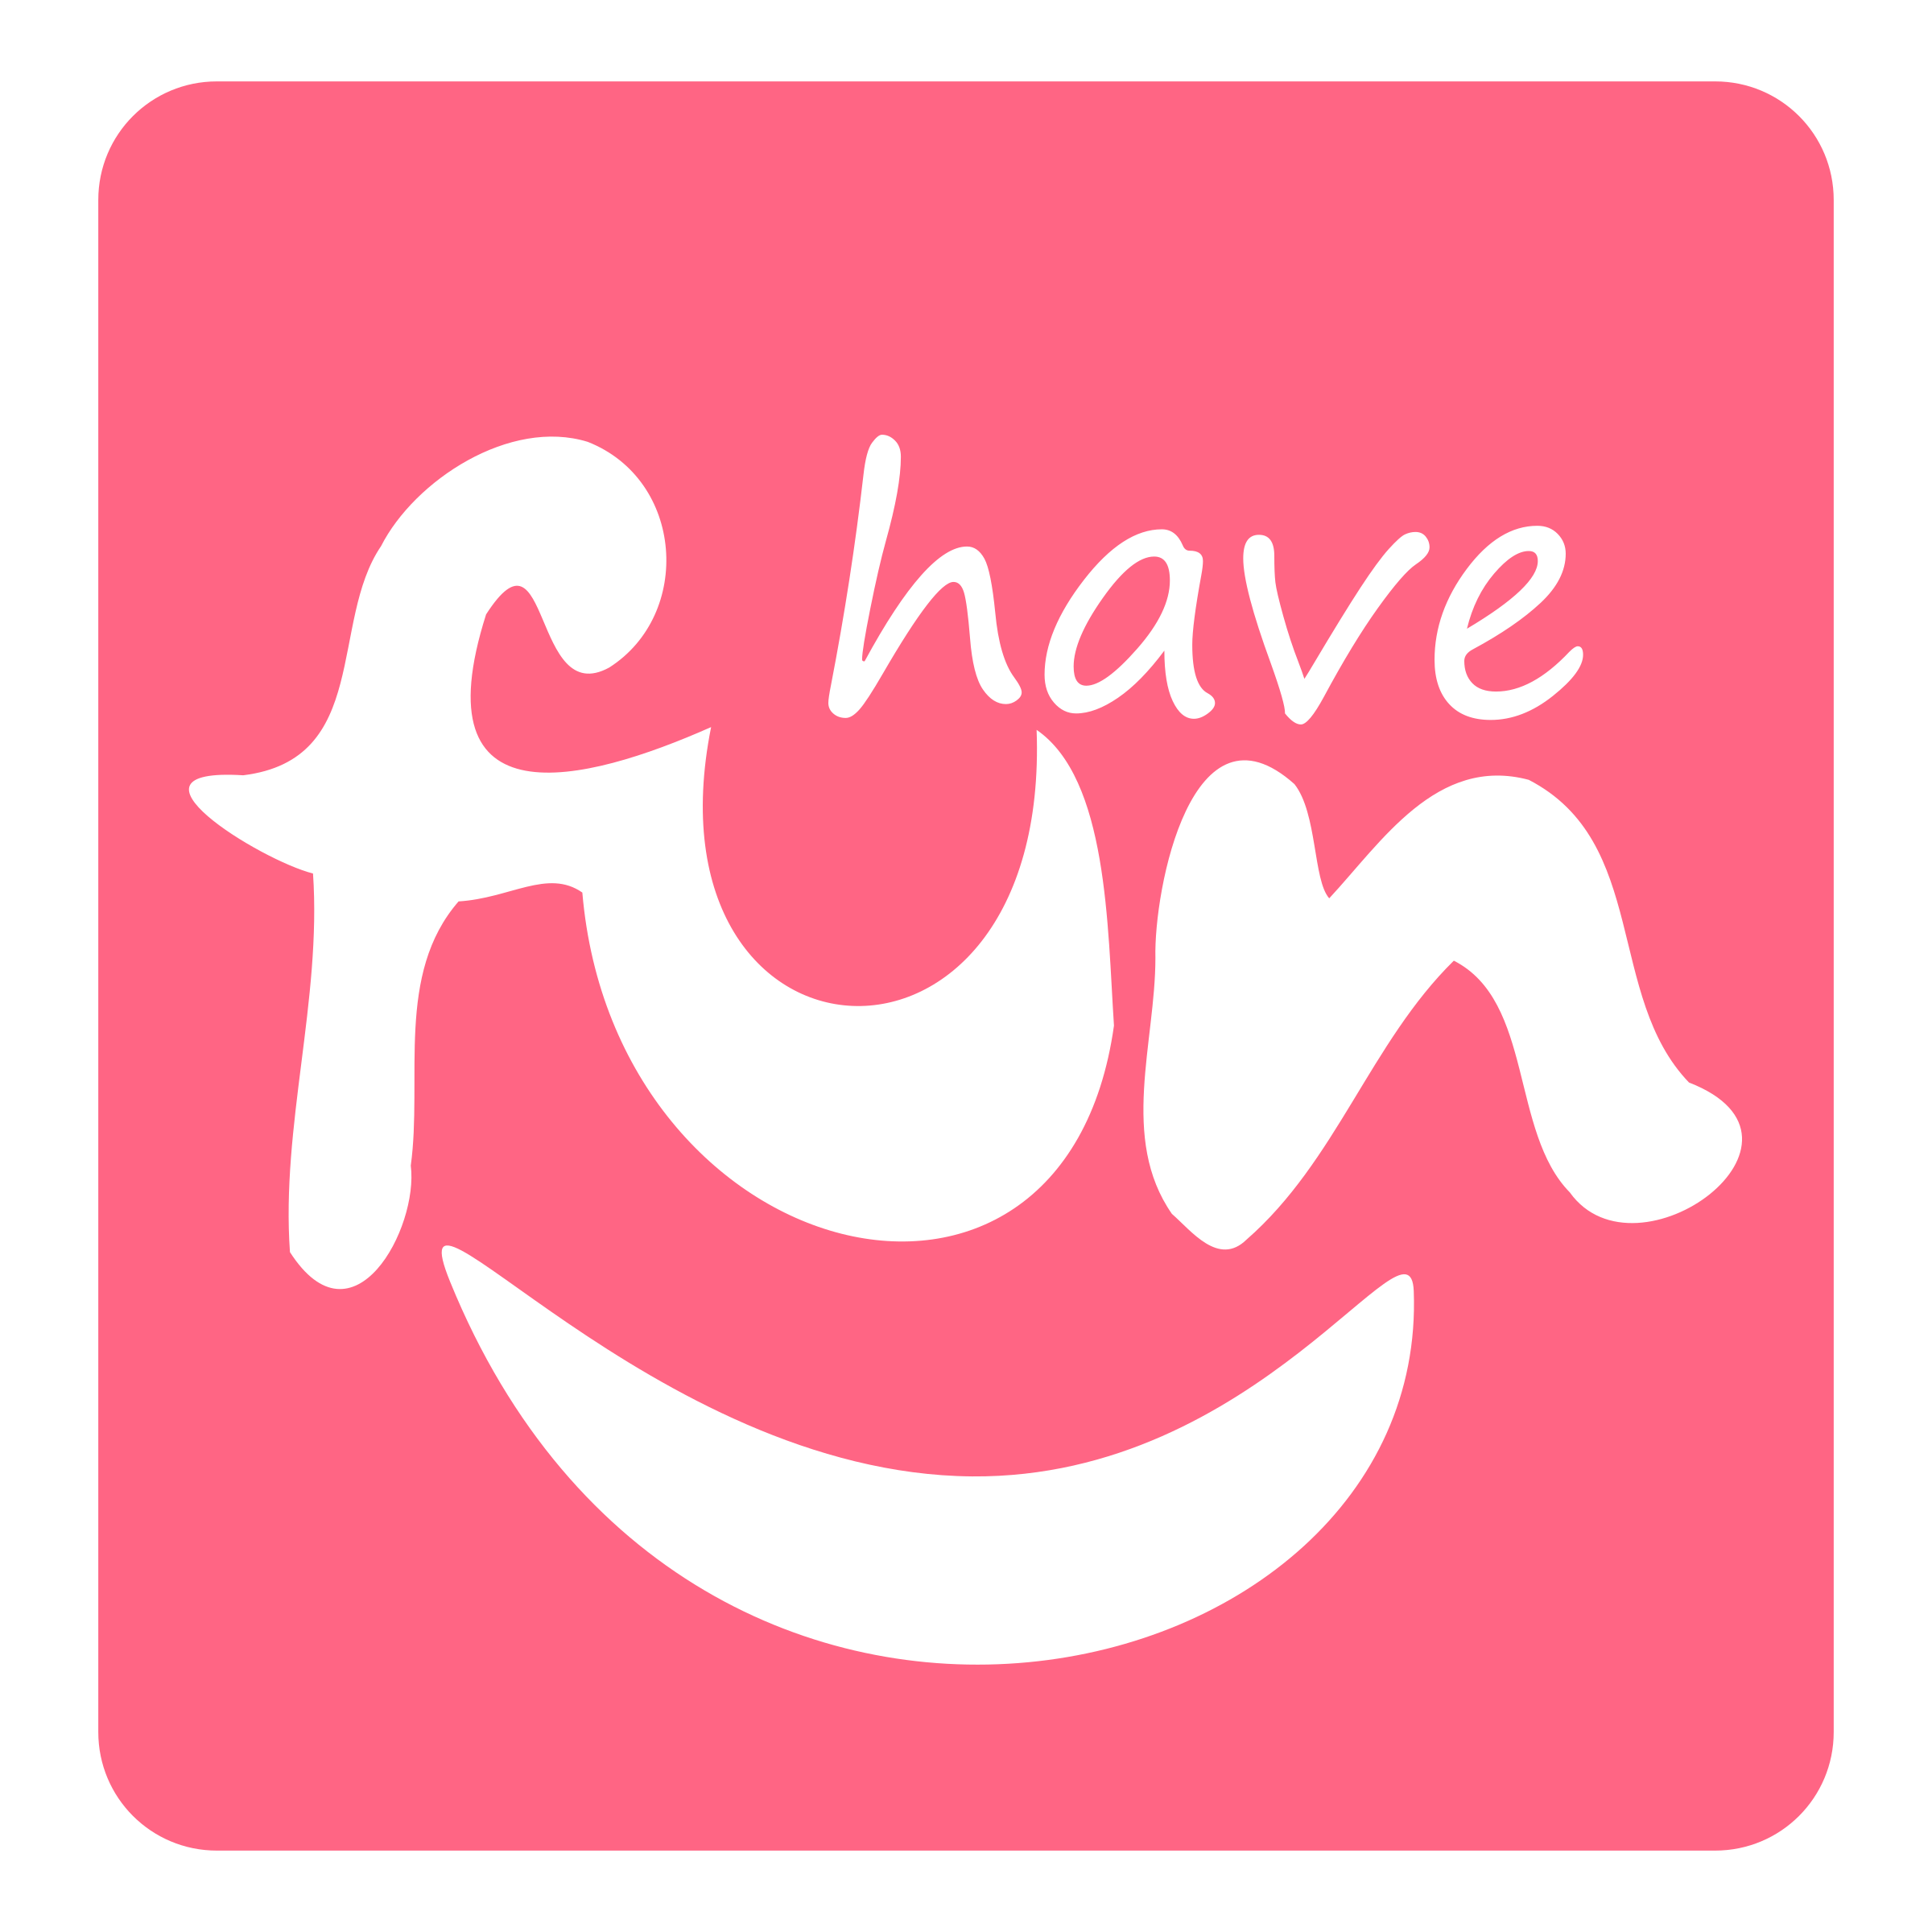 Have Fun Clipart.